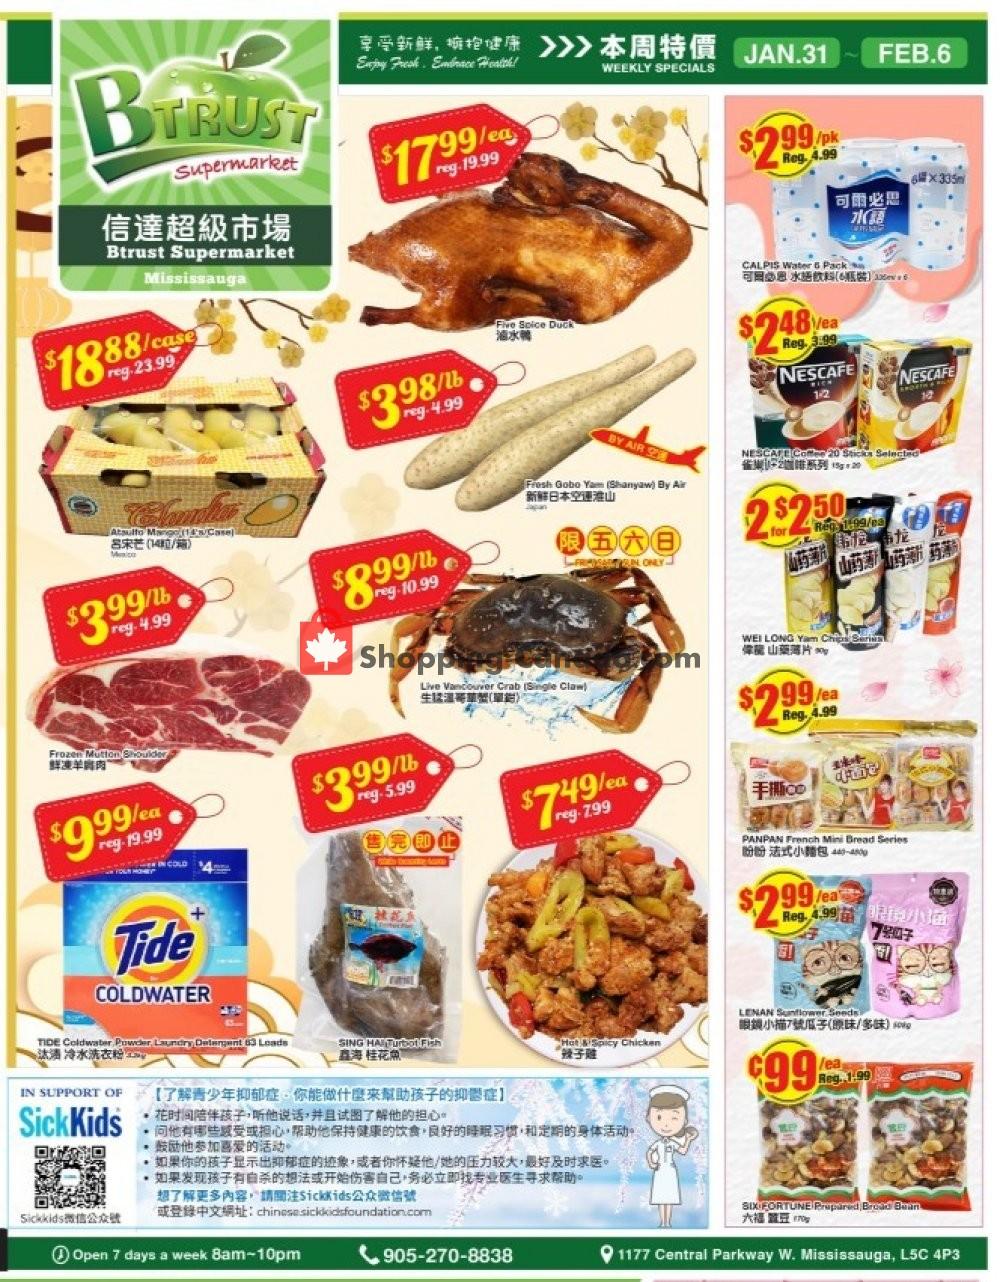 Flyer Btrust Supermarket Canada - from Friday January 31, 2020 to Thursday February 6, 2020